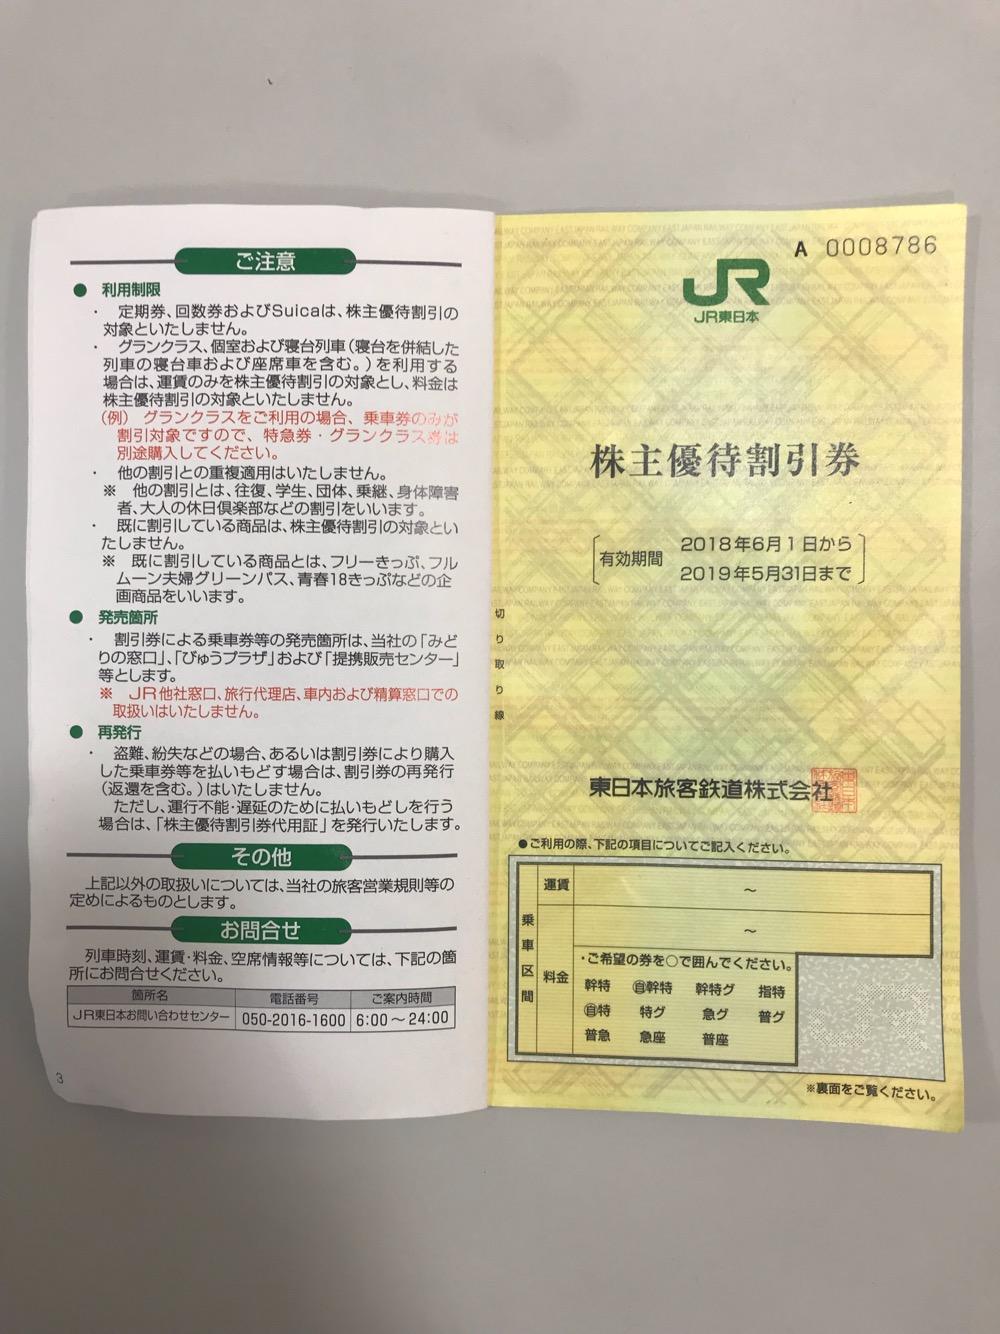 JR東日本株主優待割引券 有効期間2018年6月1日から2019年5月31日 - ご注意、その他、お問合せ